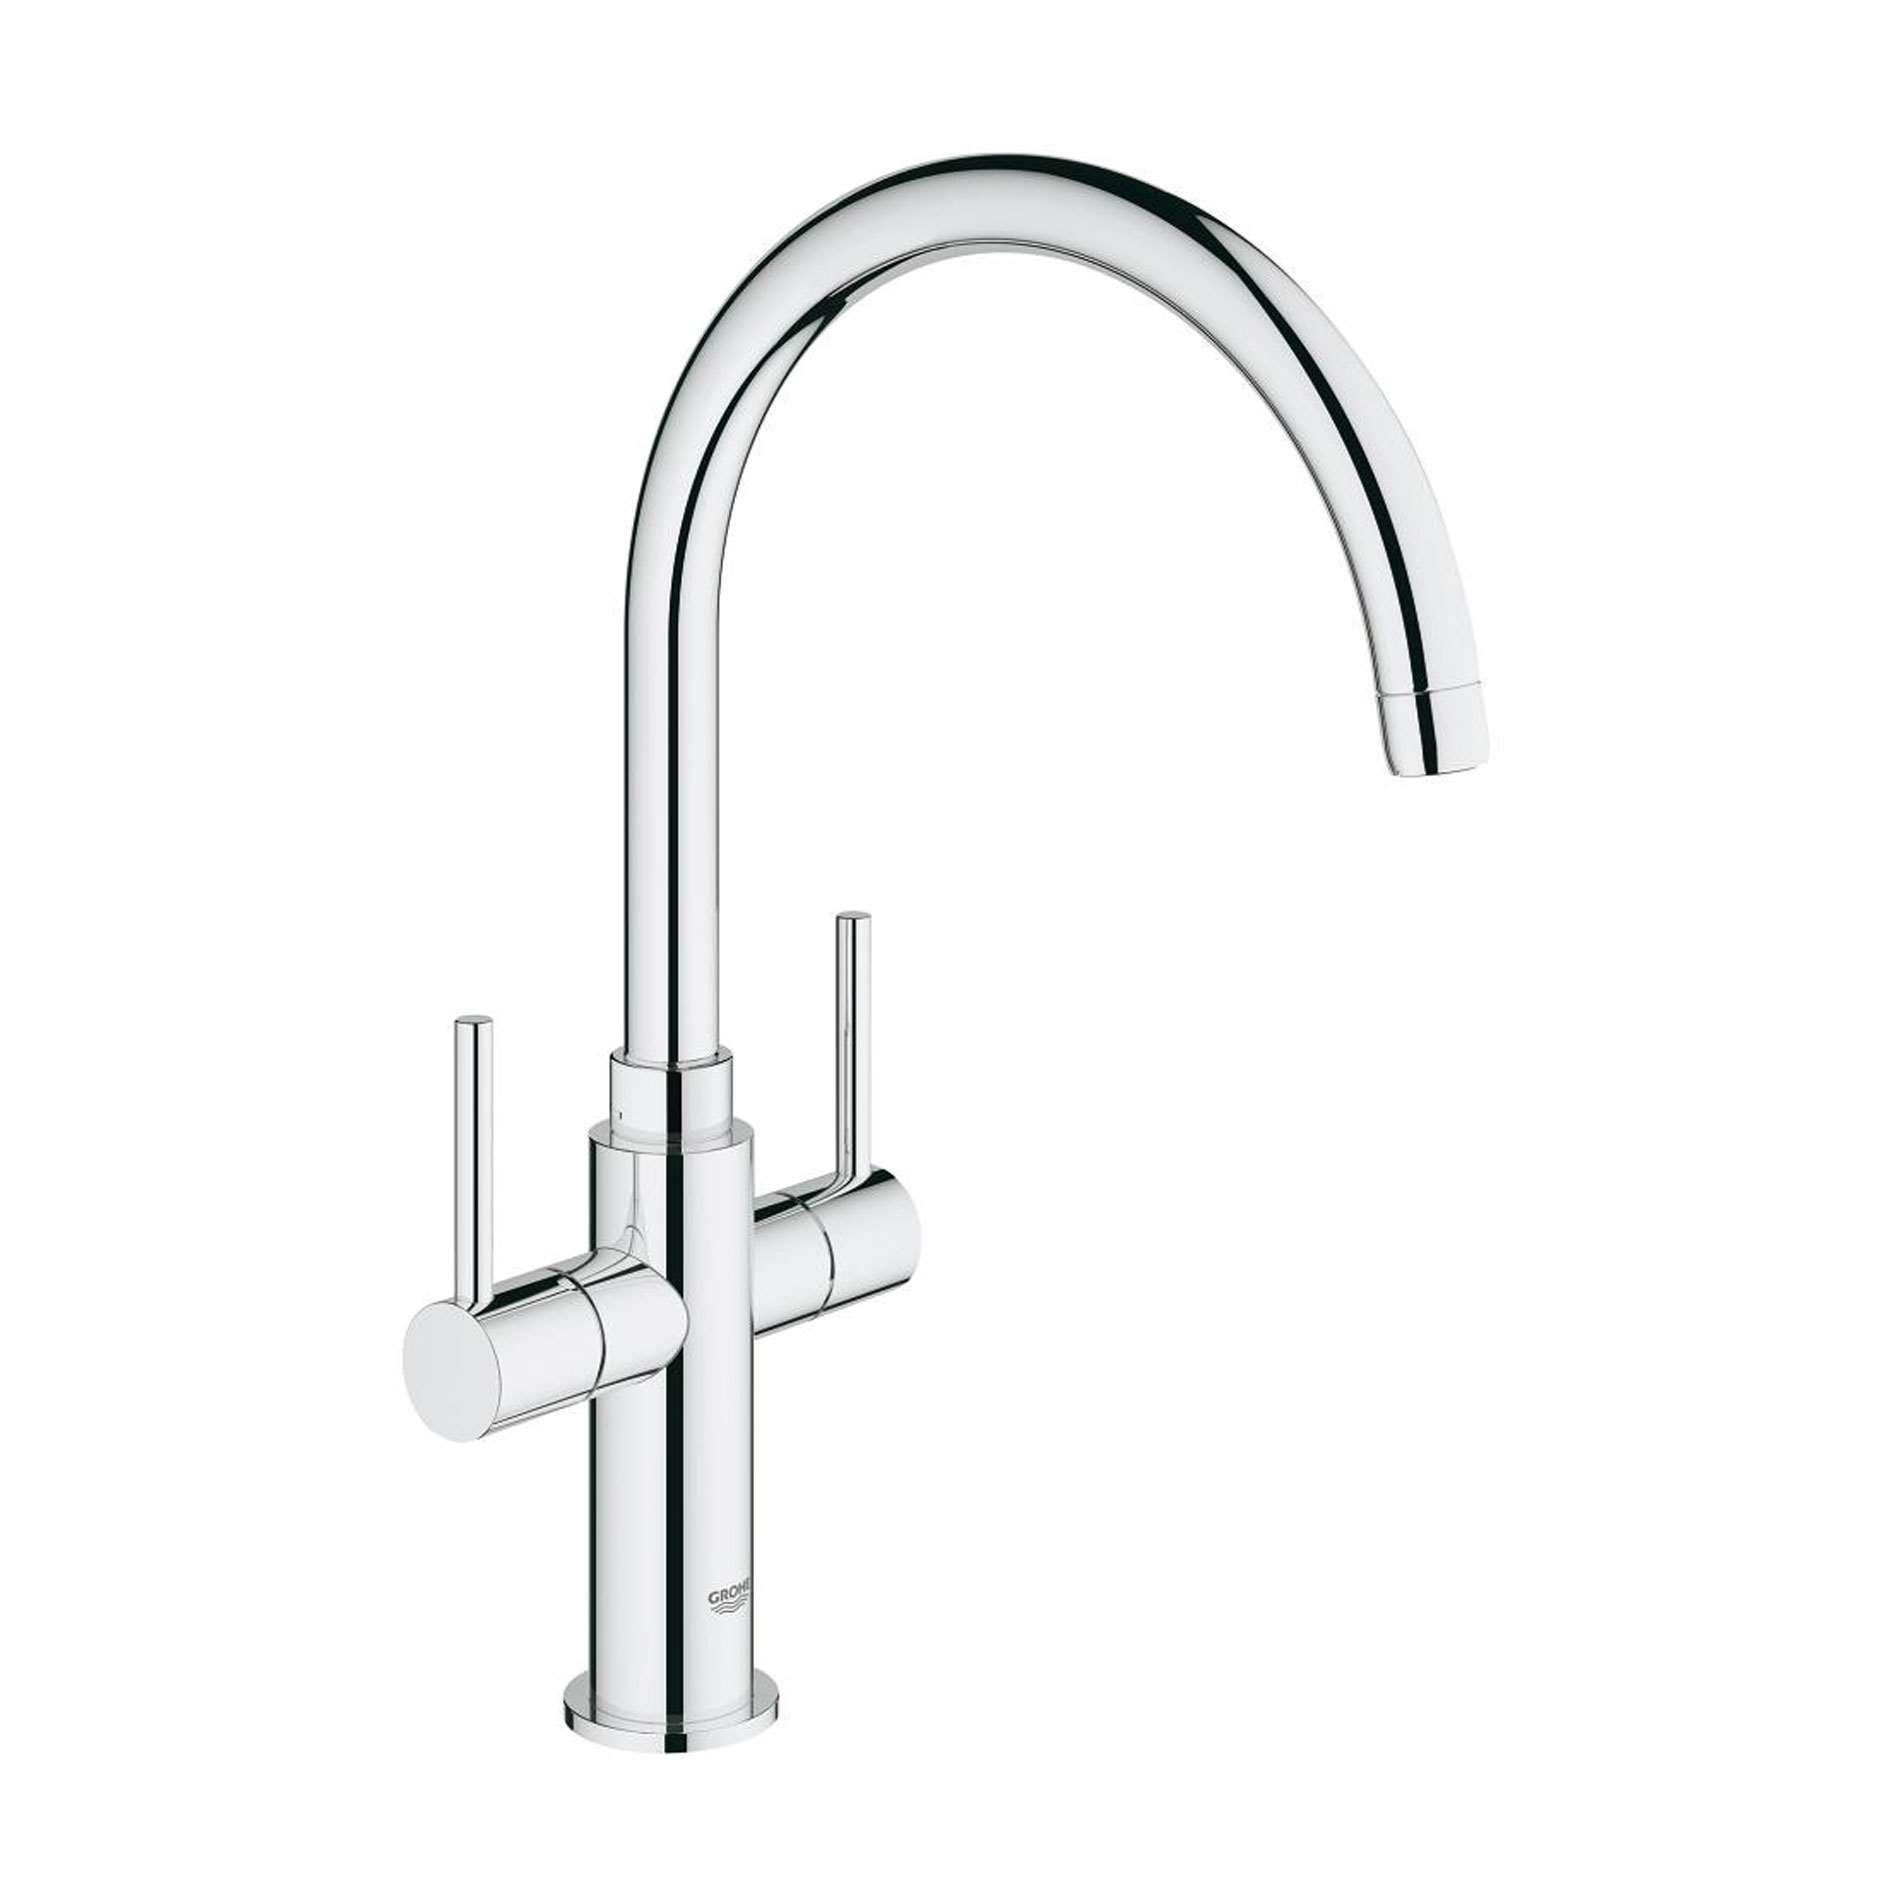 Grohe: Ambi 30190000 Chrome Tap - Kitchen Sinks & Taps